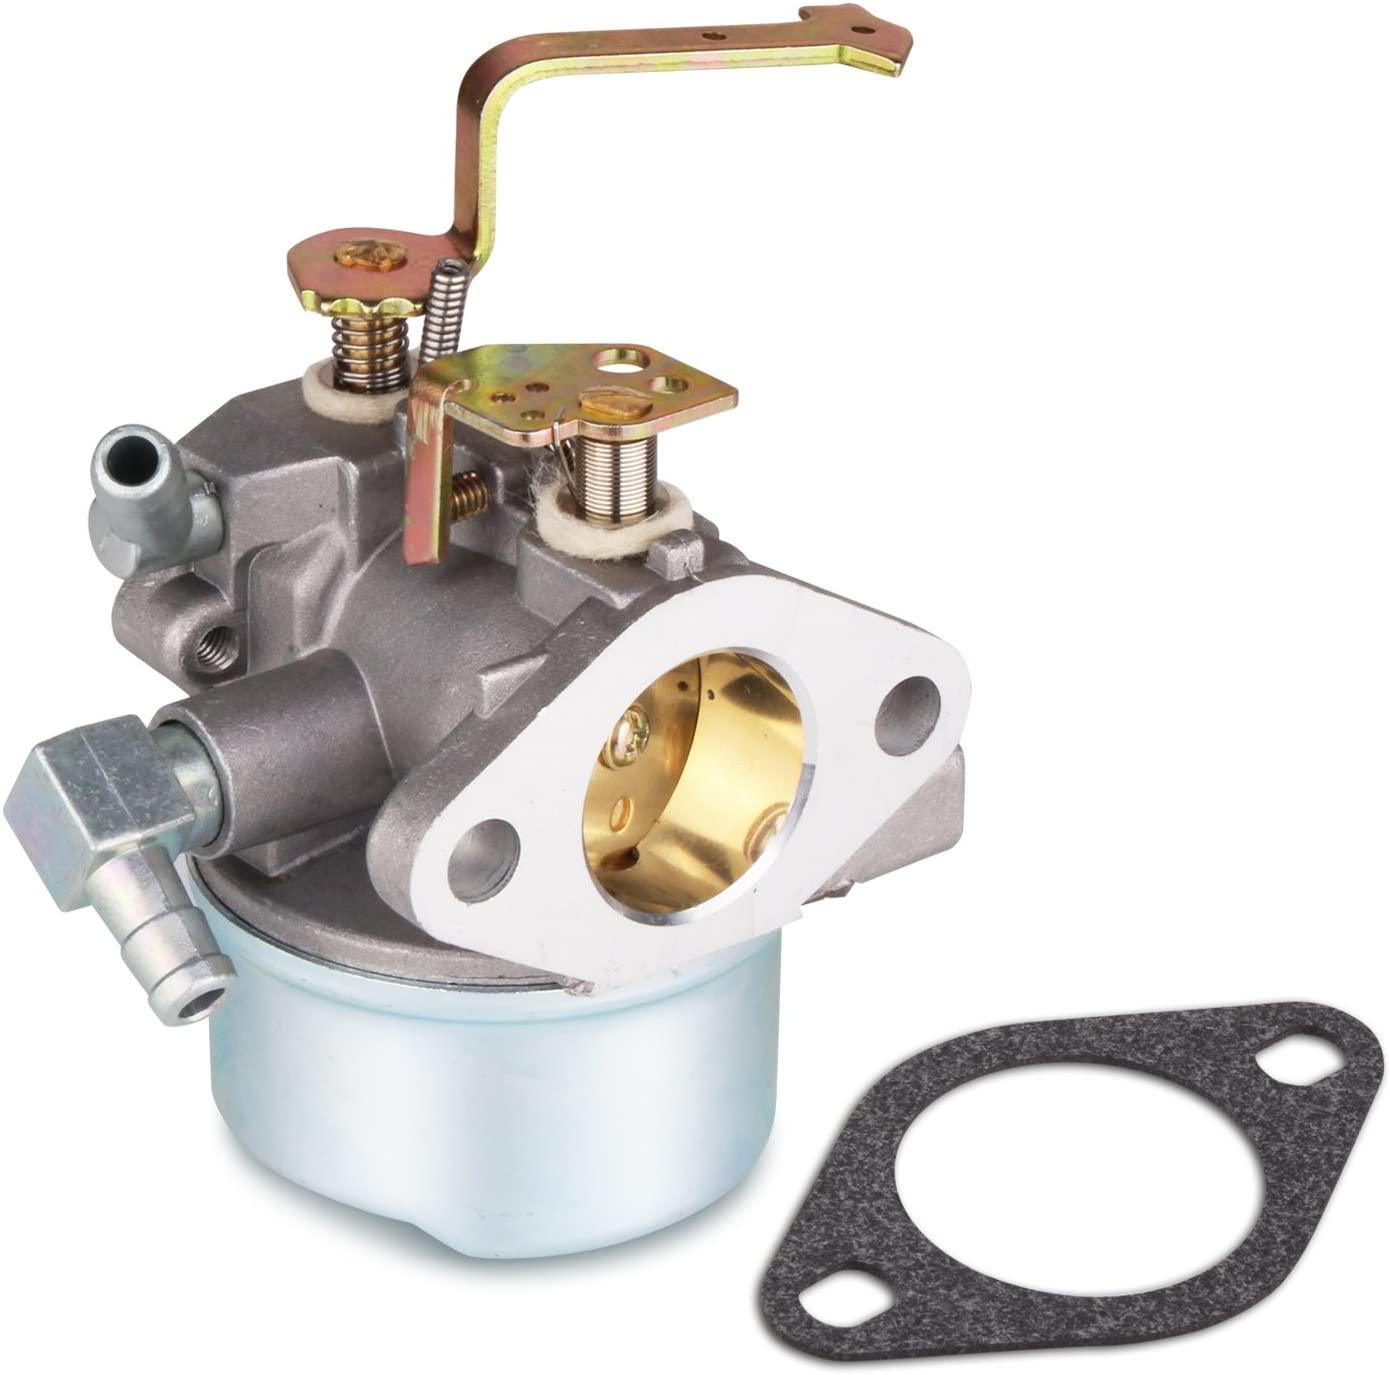 fancyU Tecumseh Carburetor Carb Perfect Replacement, Carburetor for Tecumseh 640152 640152A 640023 640051 640140 640112 HM80,HM90 HM100